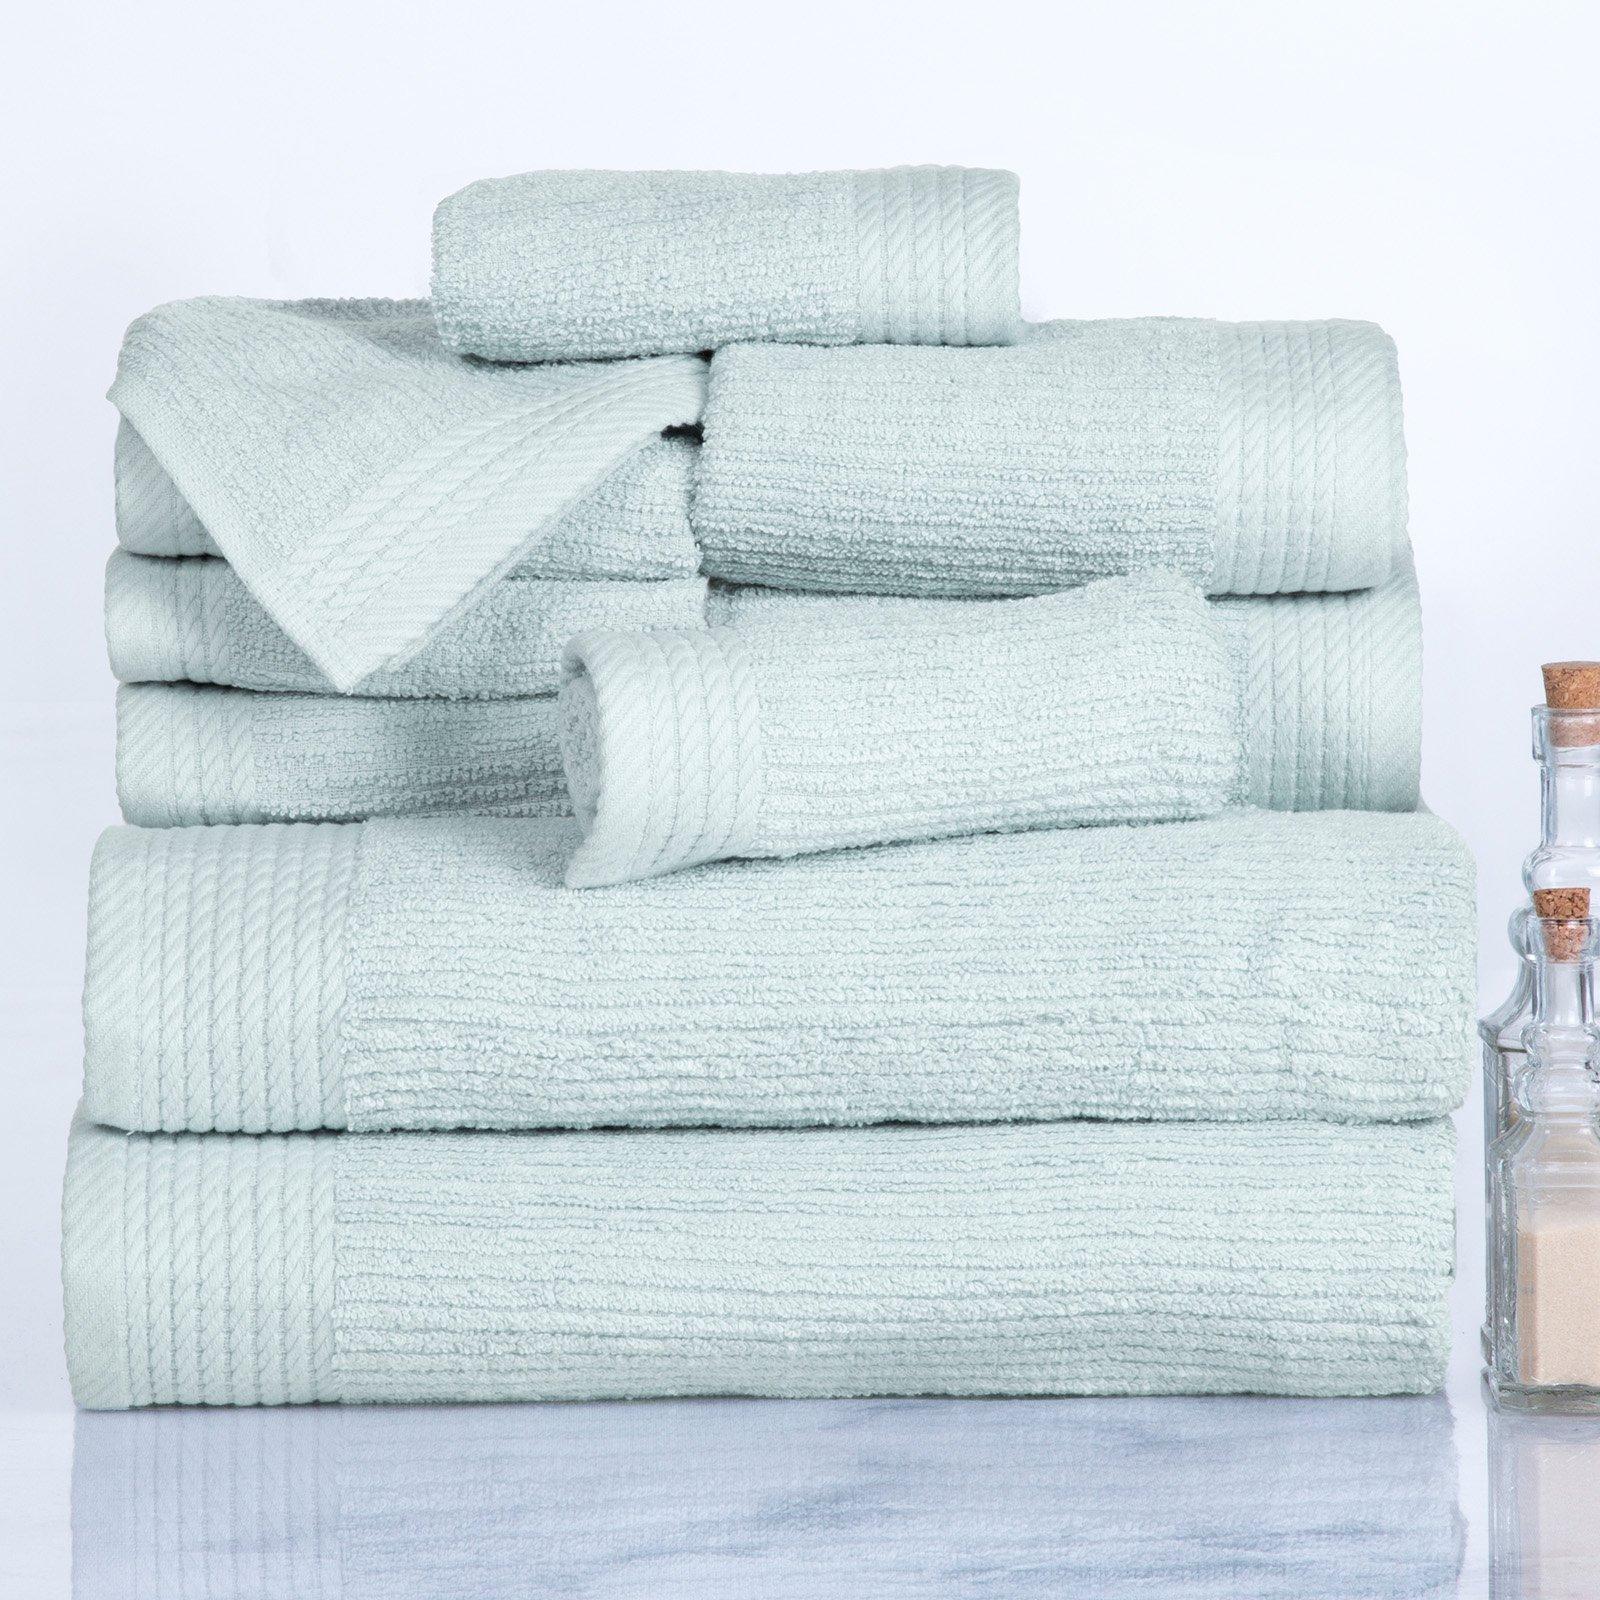 Lavish Home Ribbed Egyptian Cotton 10 Piece Towel Set Seafoam Cotton Bath Towels Towel Set Egyptian Cotton Towels